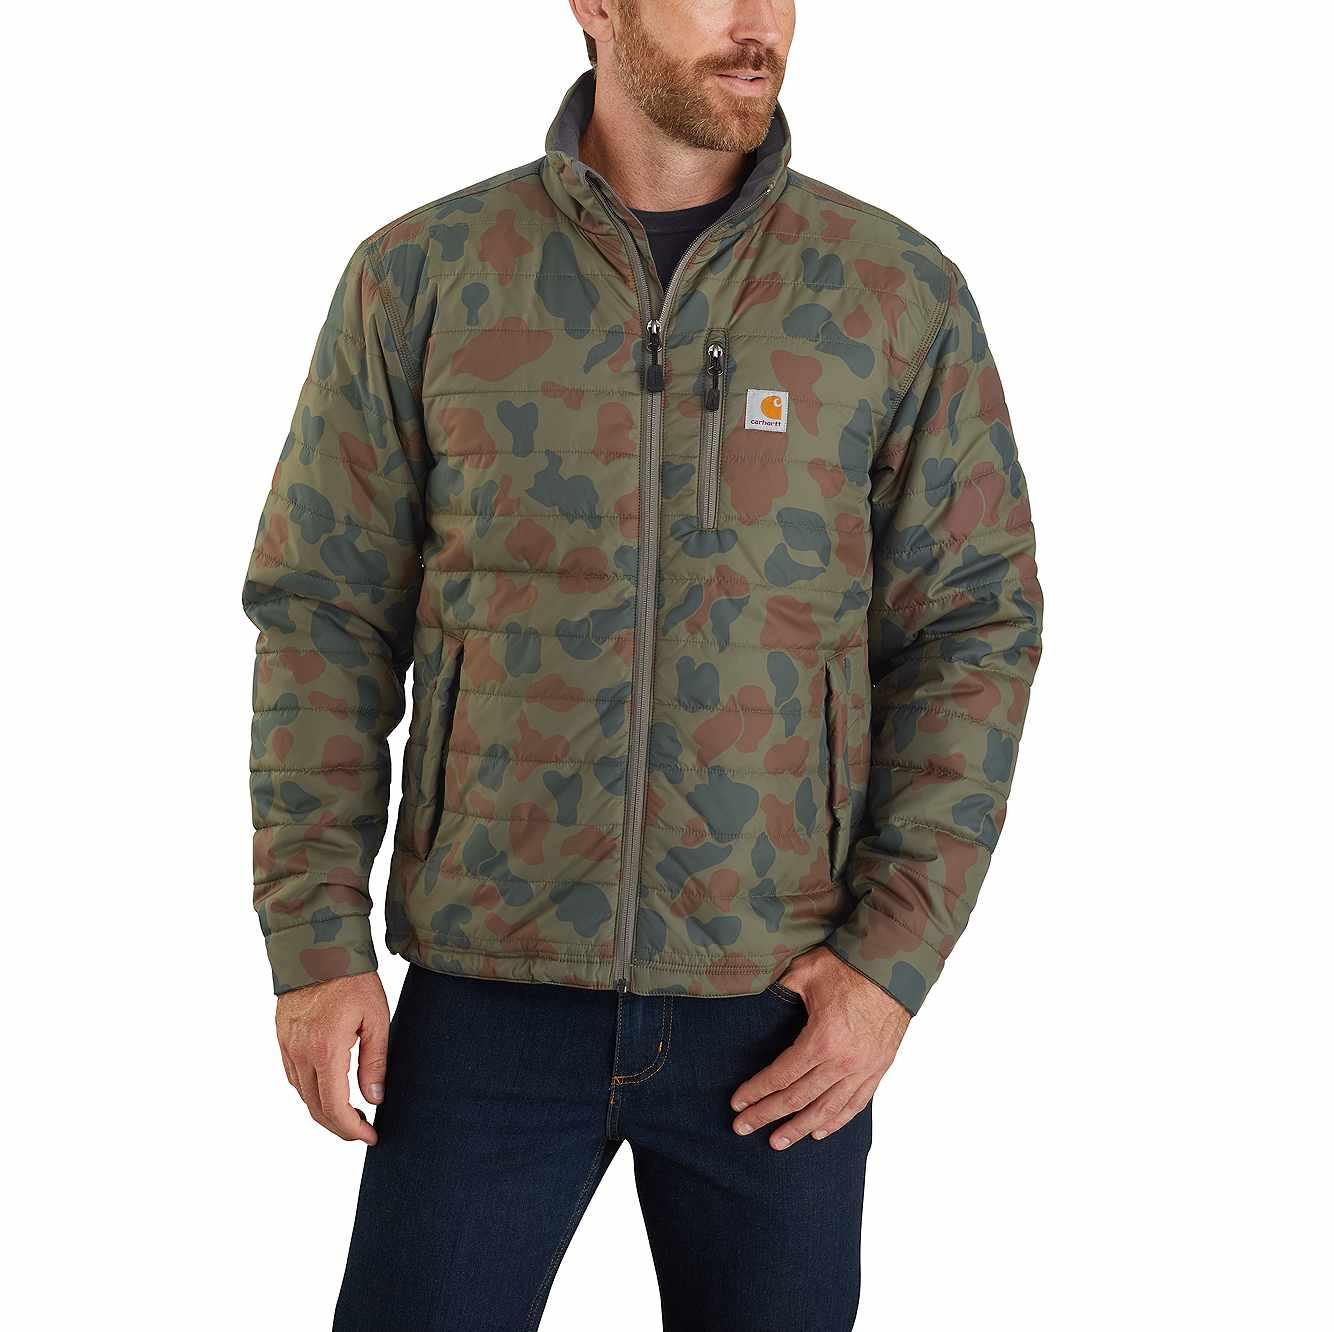 Picture of Carhartt® Rain Defender® Lightweight Insulated Camo Mock Neck Jacket in Moss Duck Camo